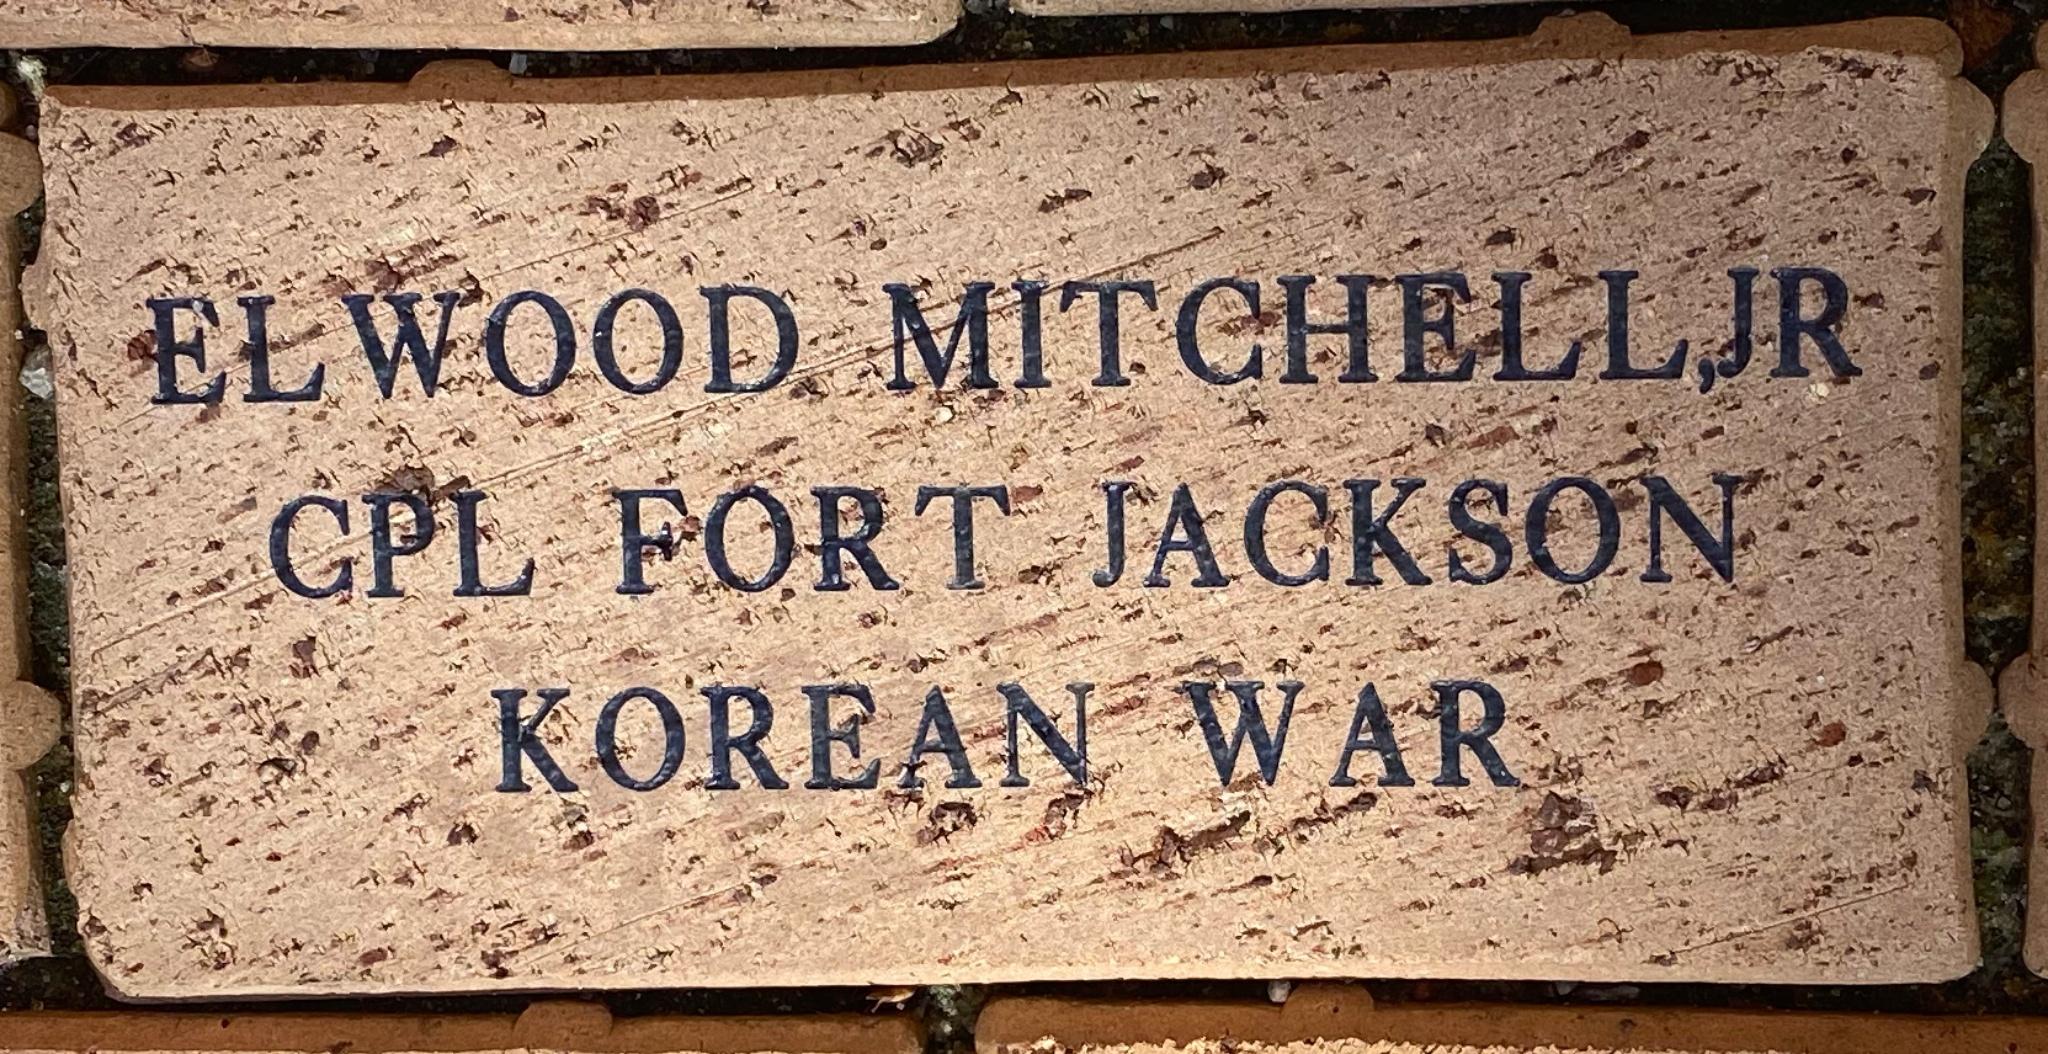 ELWOOD MITCHELL,JR CPL FORT JACKSON KOREAN WAR